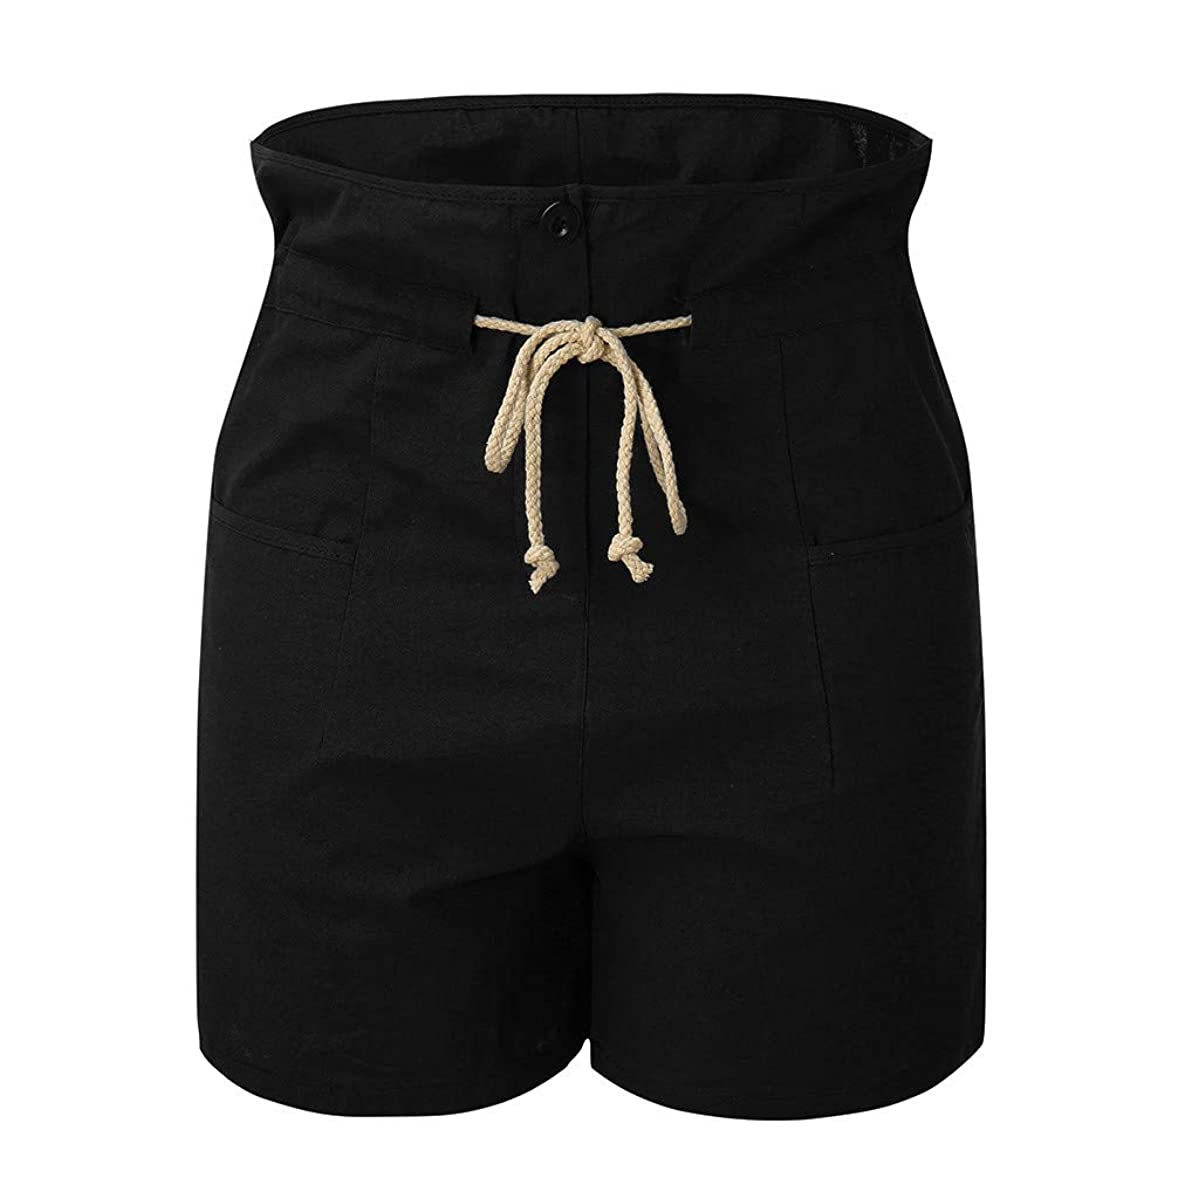 Botrong Women's Casual Cotton Pants Summer Shorts Jersey Walking Shorts